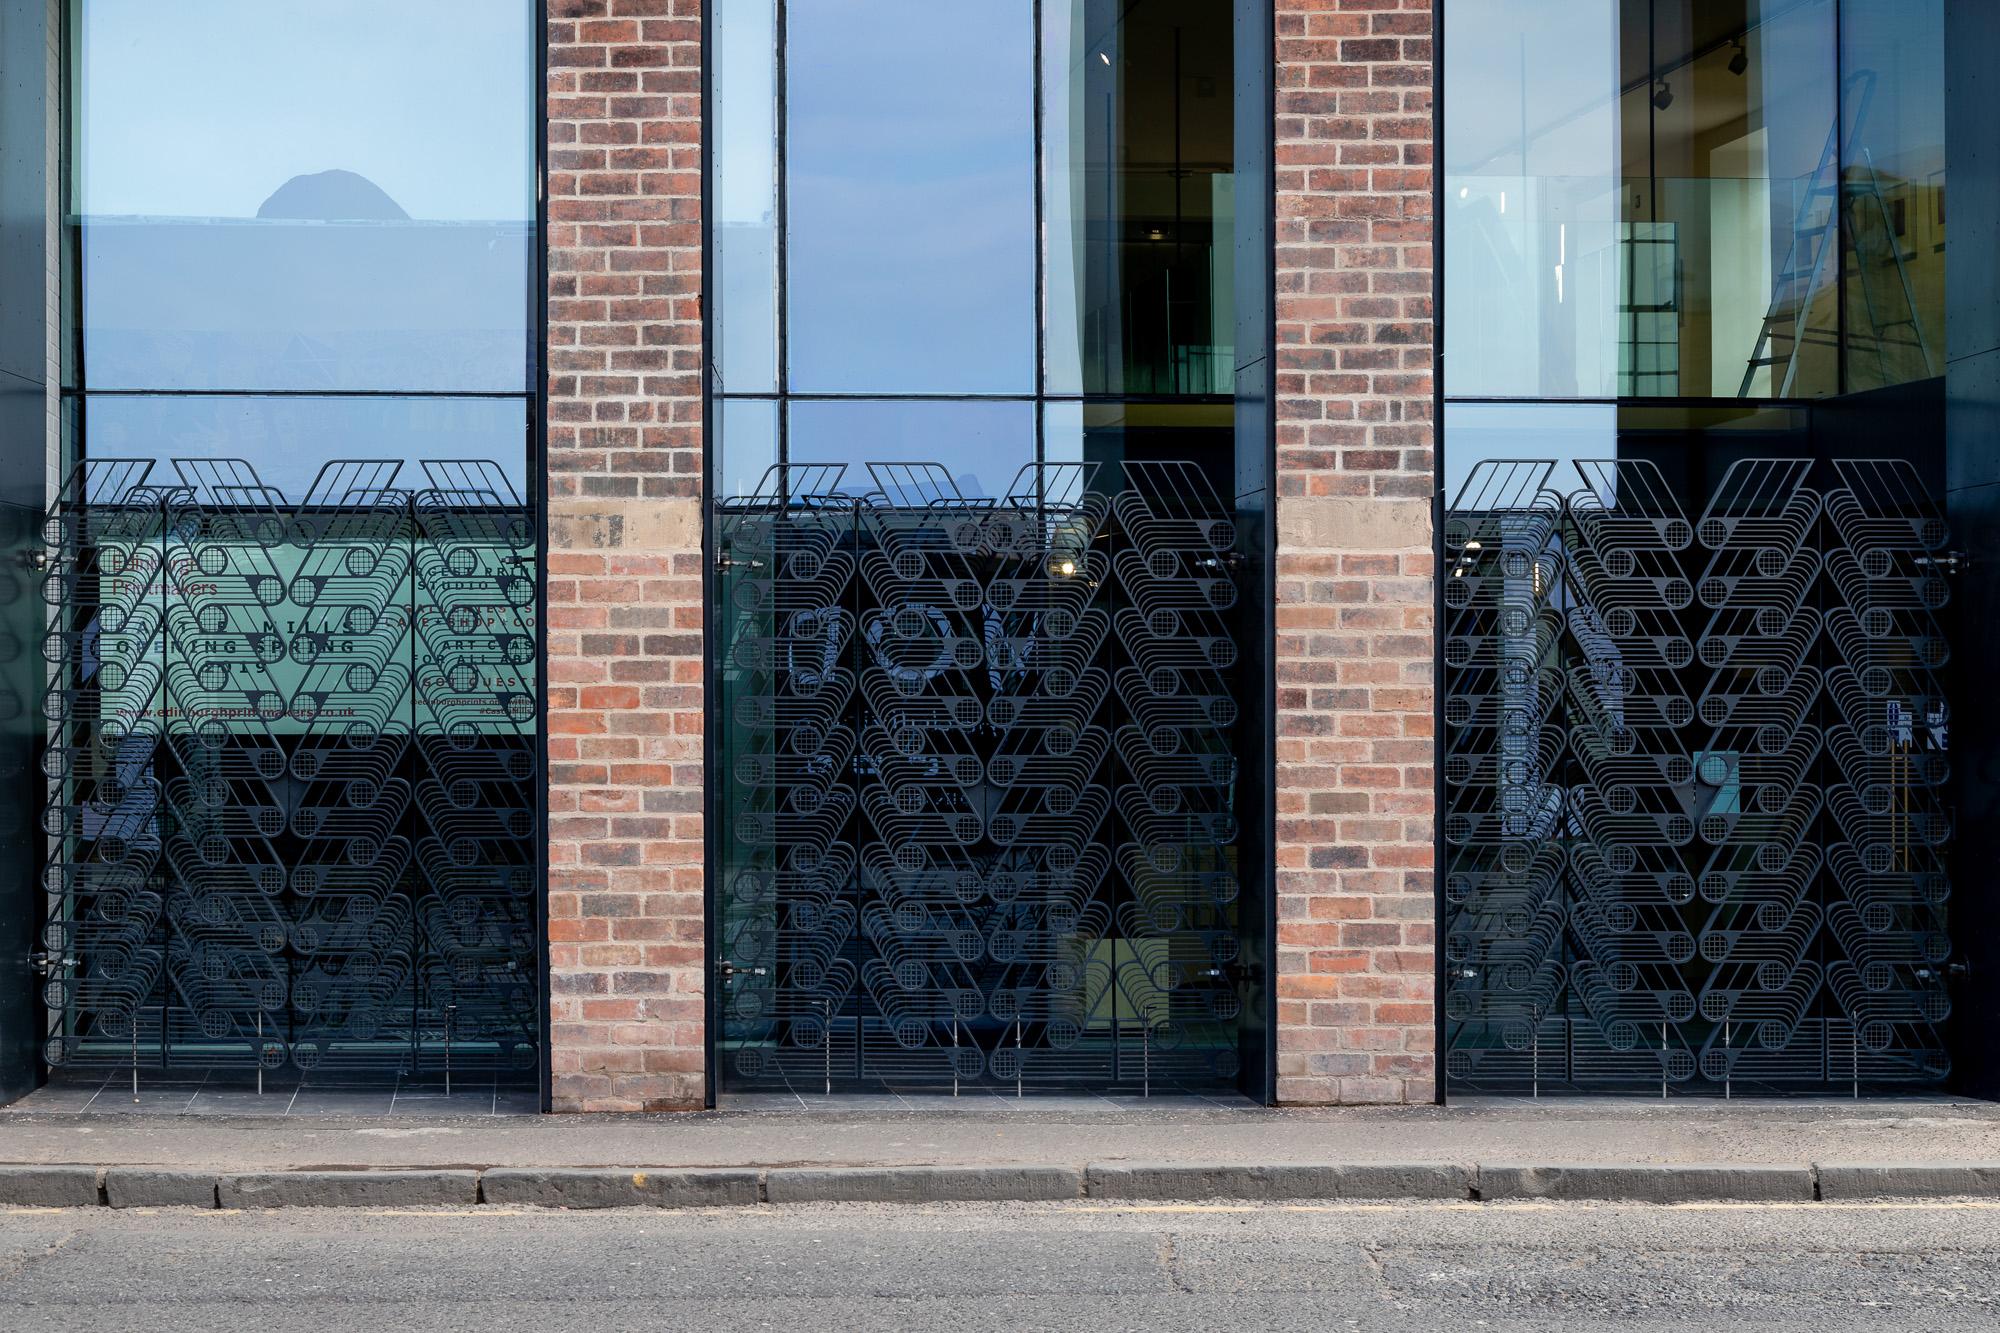 Edinburgh Printmaker Gates